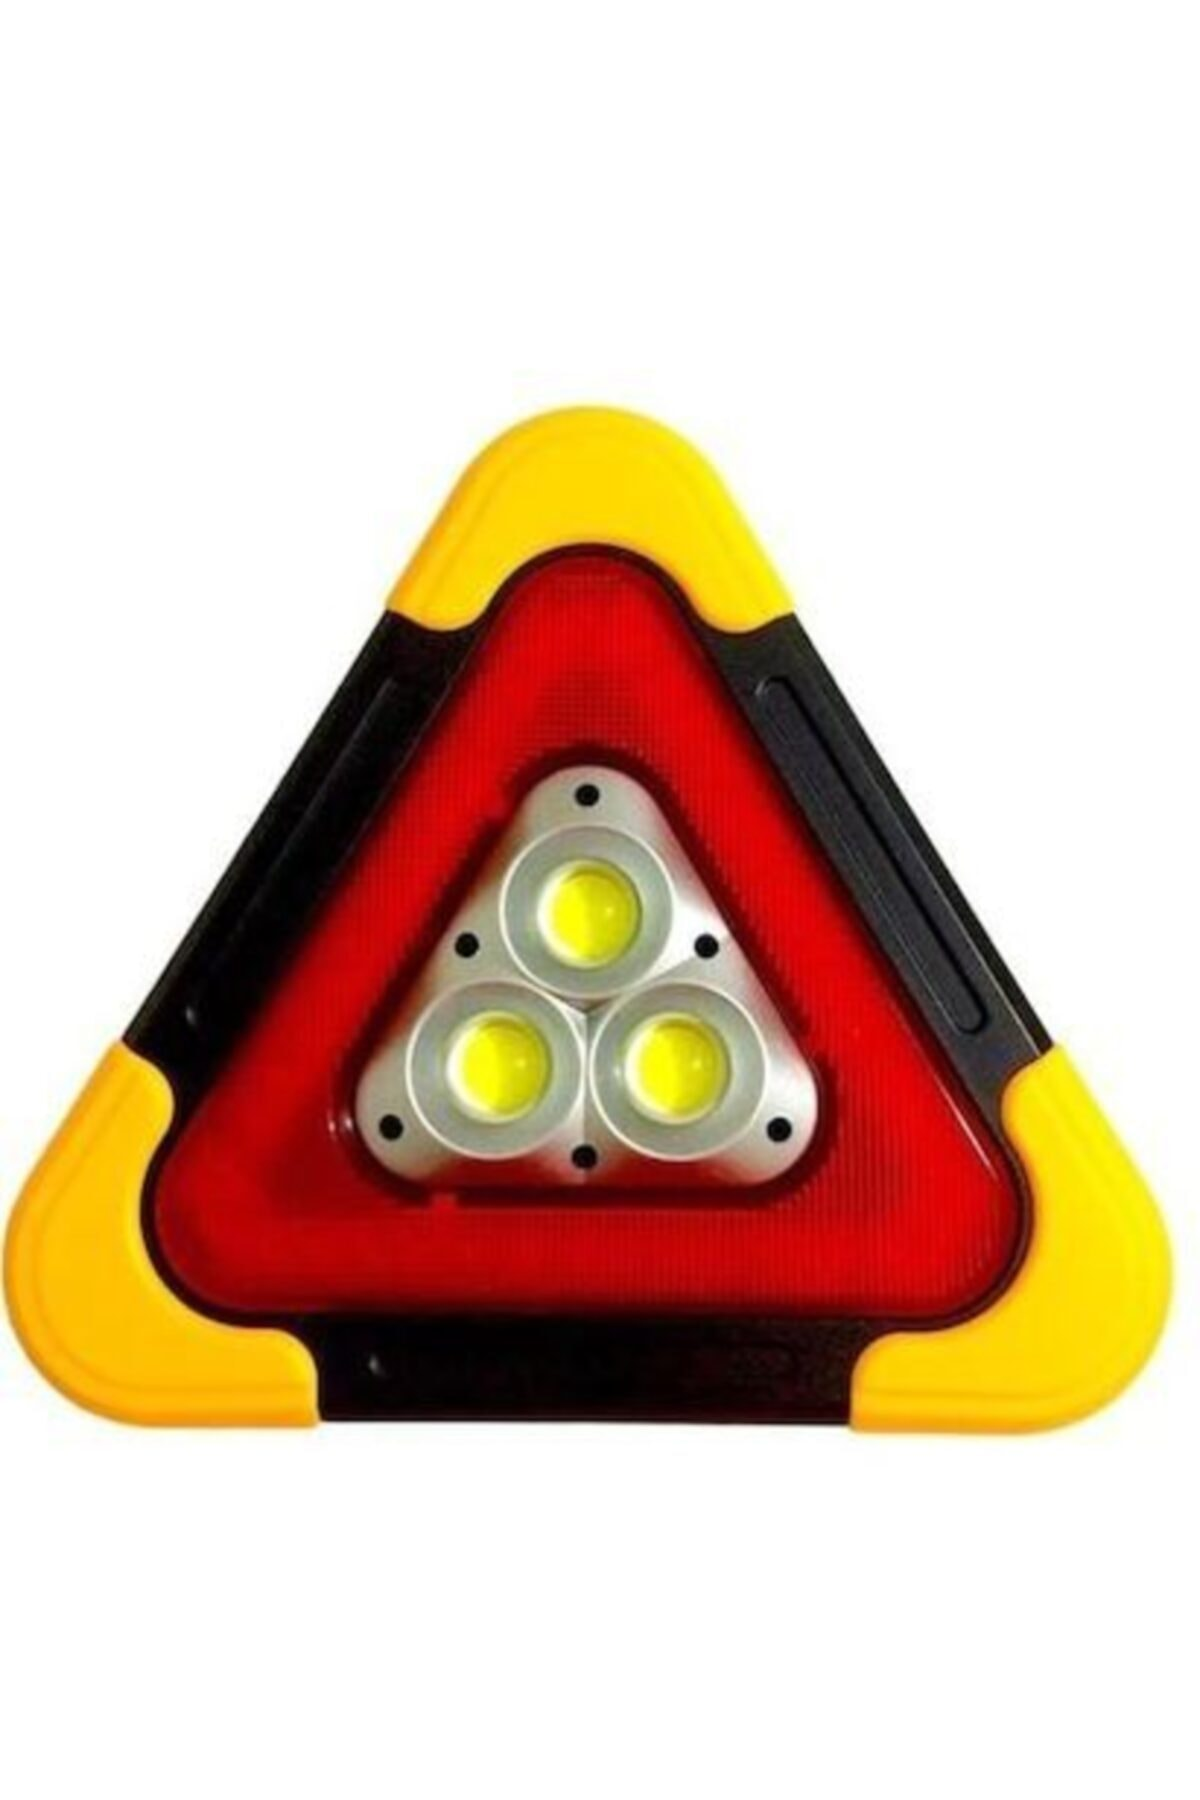 Starmax Xx-66 Çok Fonksiyonlu Reflektör Işıklı Ikaz Lambası 8014 1